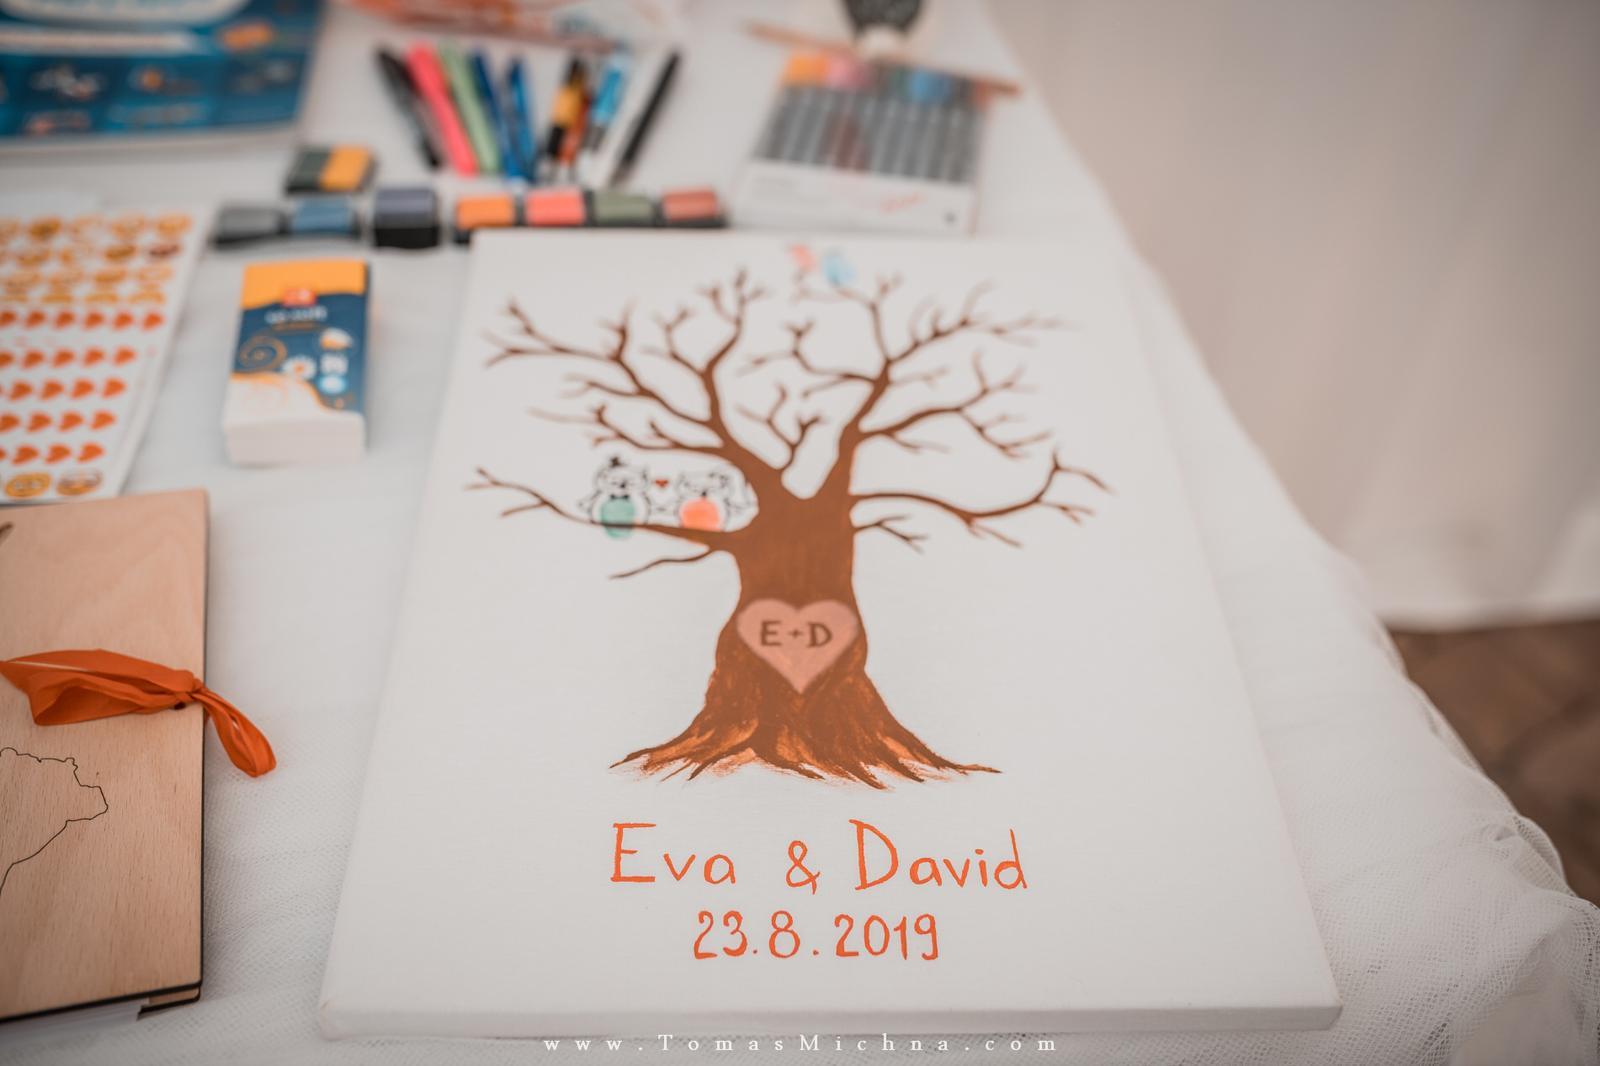 ♥ Eva & David ♥ - Obrázok č. 4